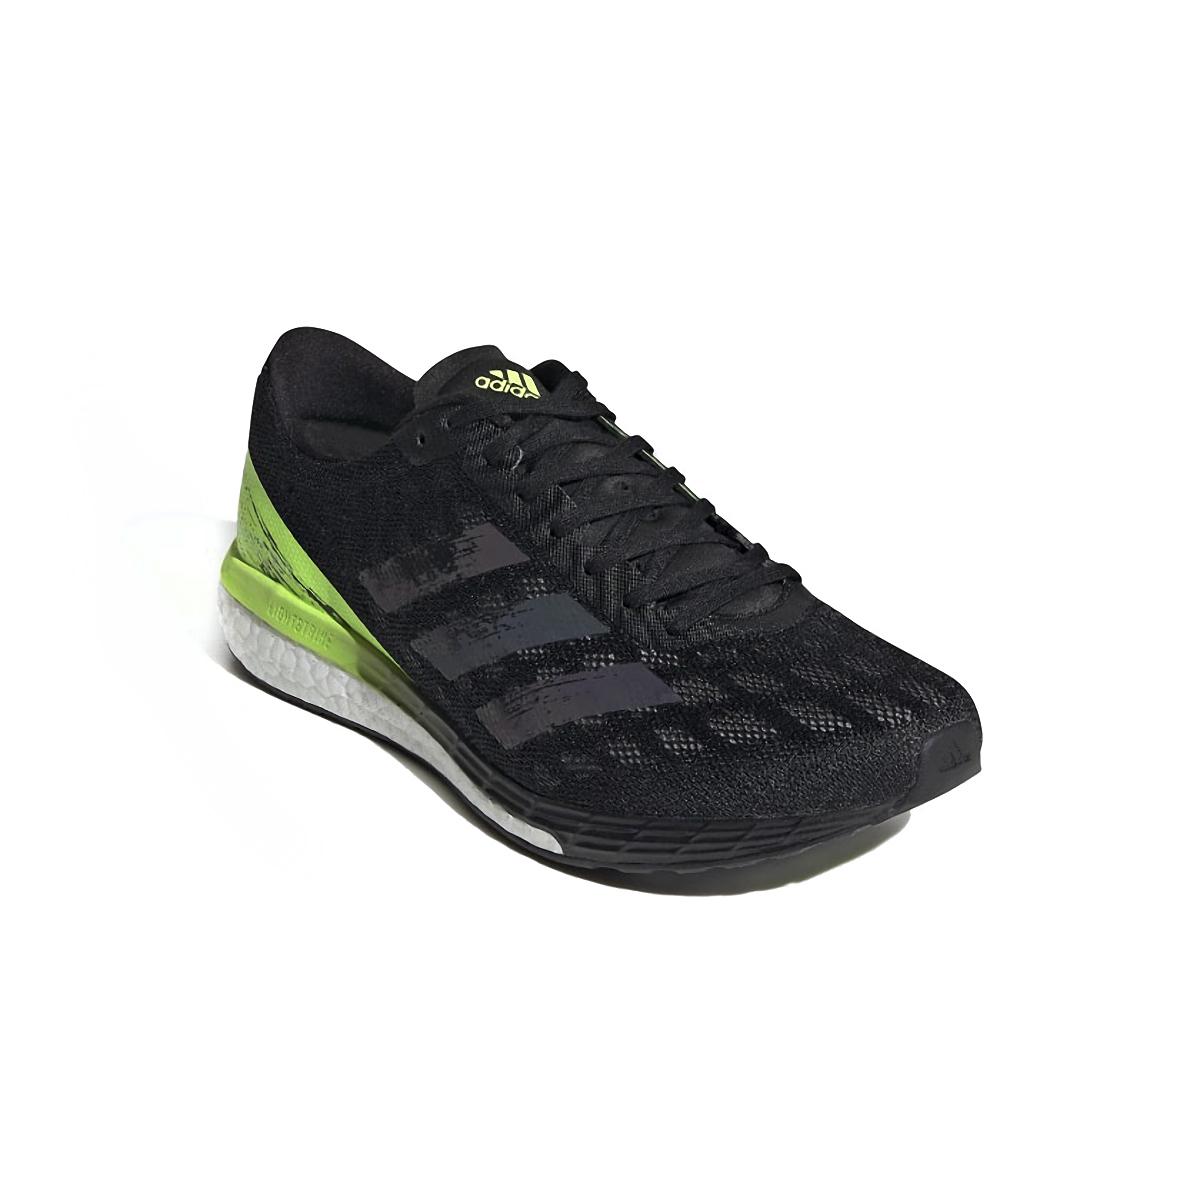 Men's Adidas Adizero Boston 9 Running Shoe - Color: Core Black/Core - Size: 6.5 - Width: Regular, Core Black/Core, large, image 4